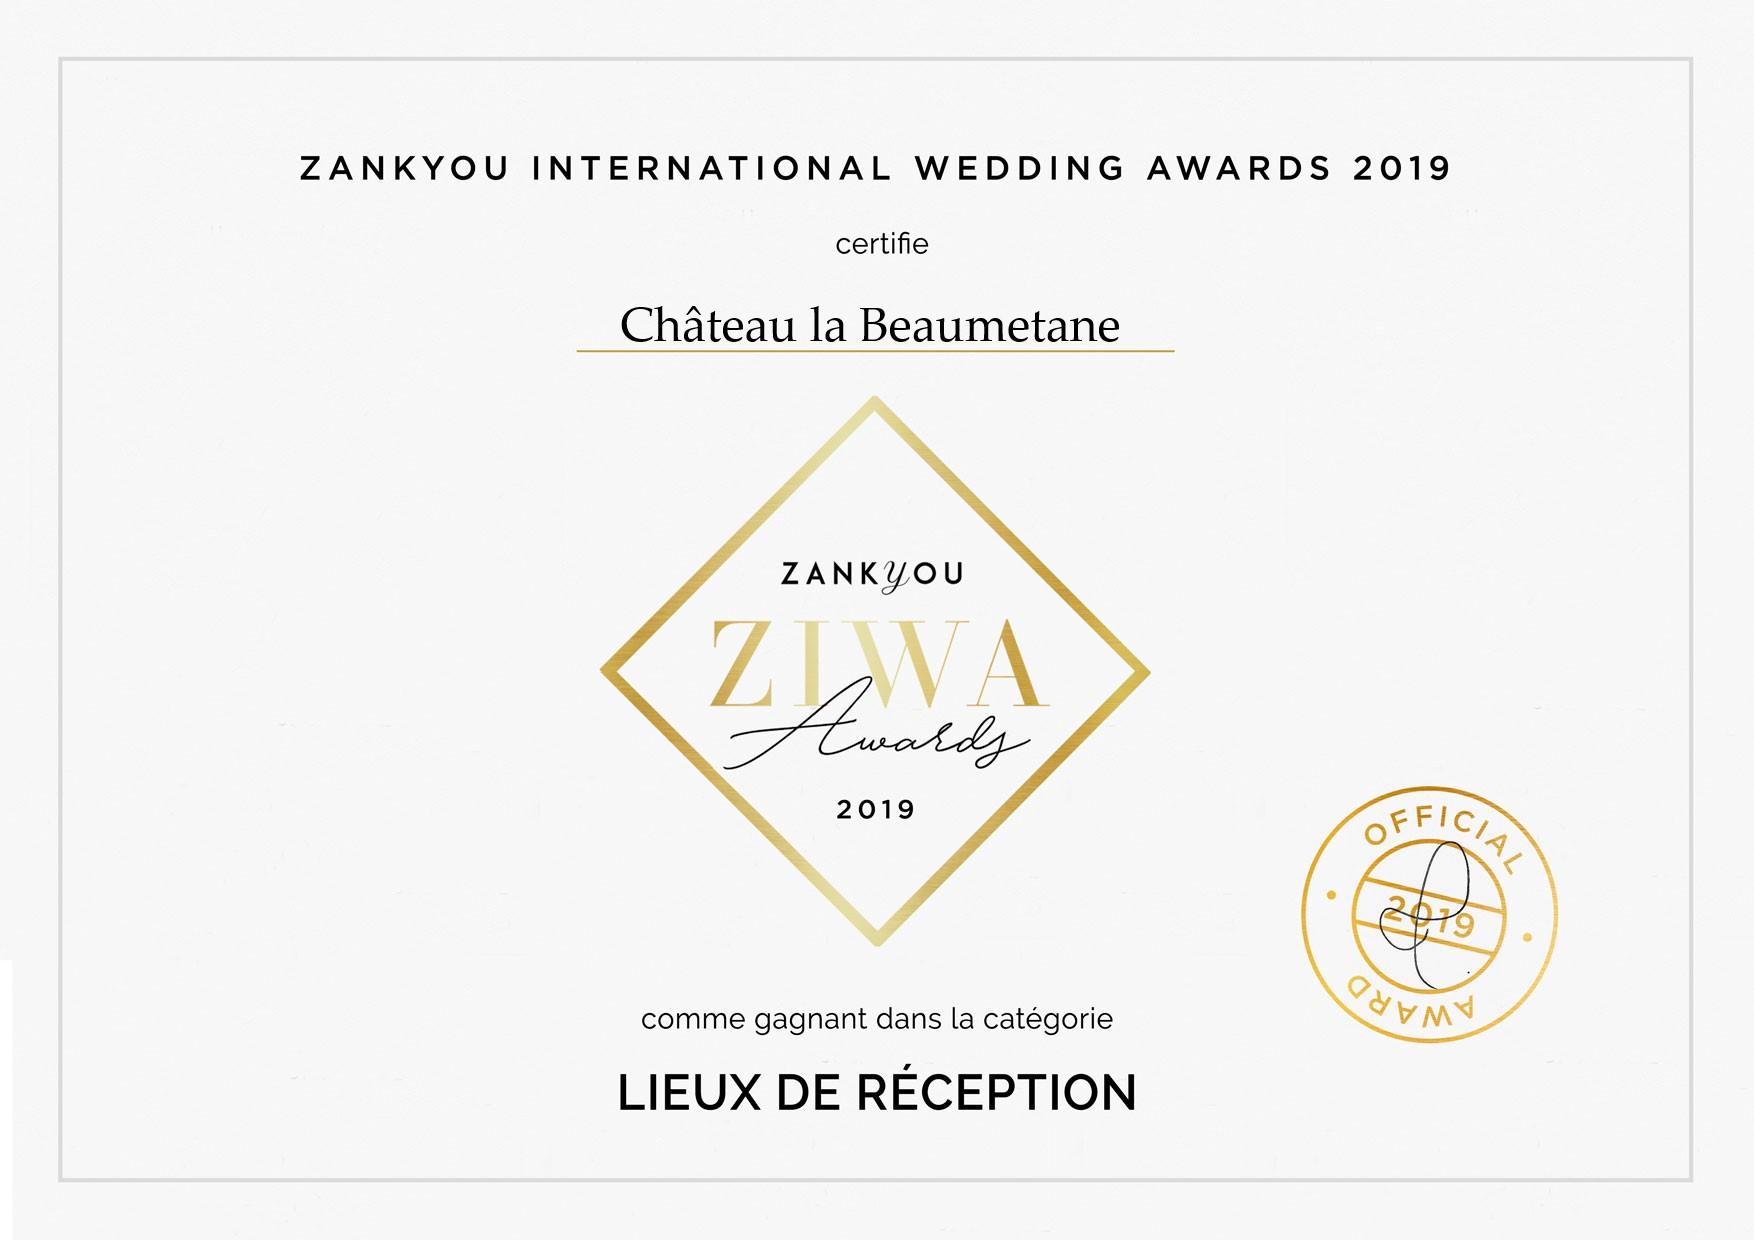 diplome-award-venue-zankyou-lieu-reception-international-france-provence